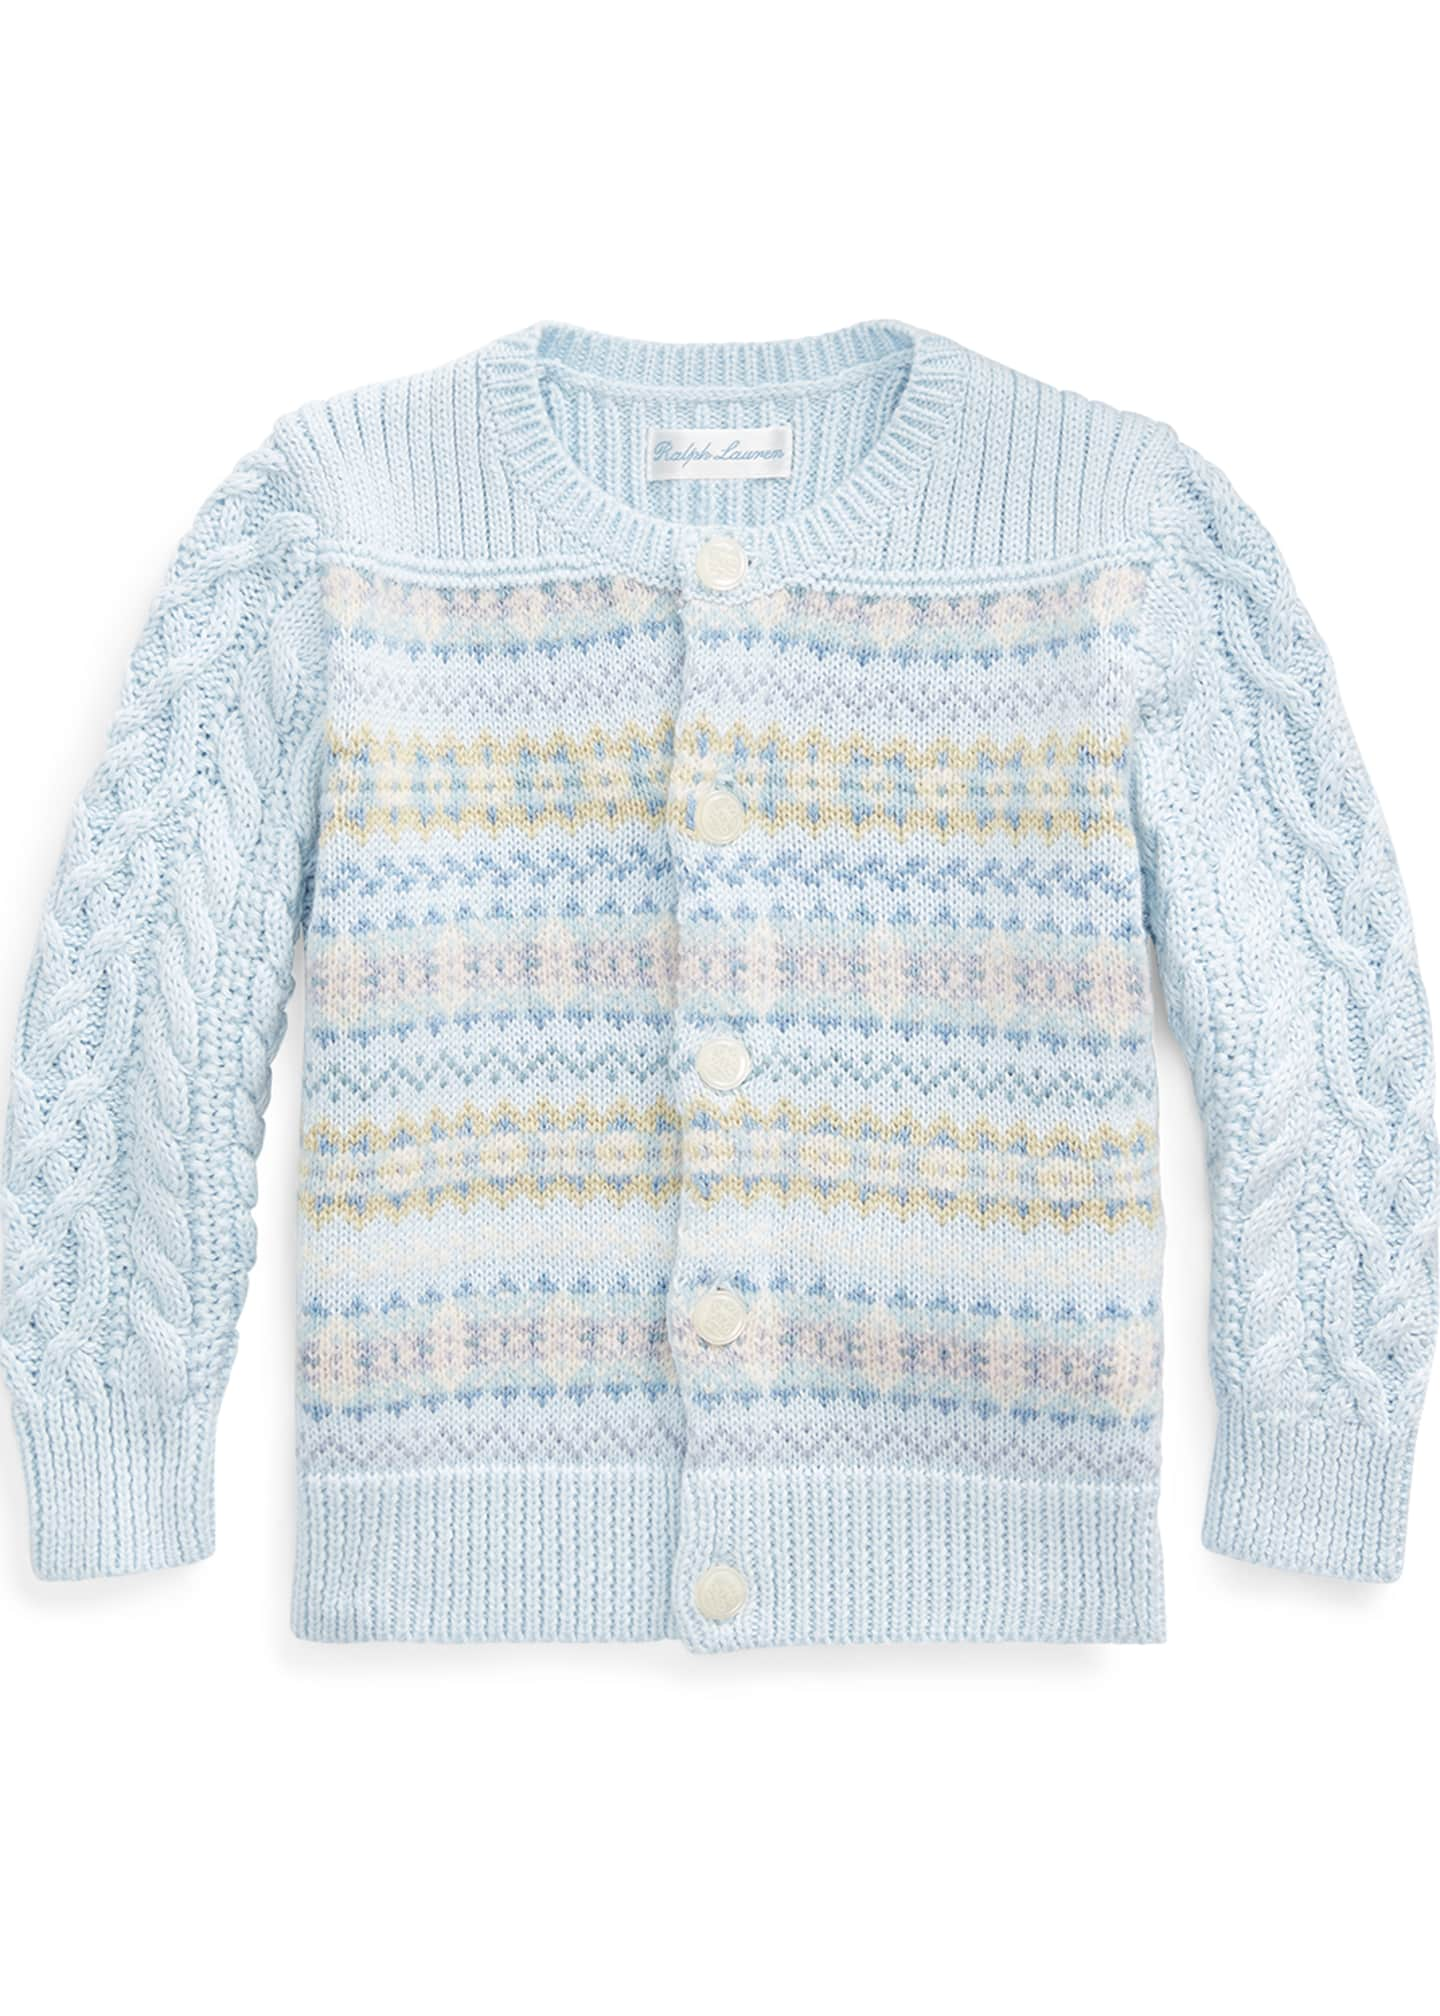 Ralph Lauren Childrenswear Fair Isle Cable-Knit Cotton/Wool